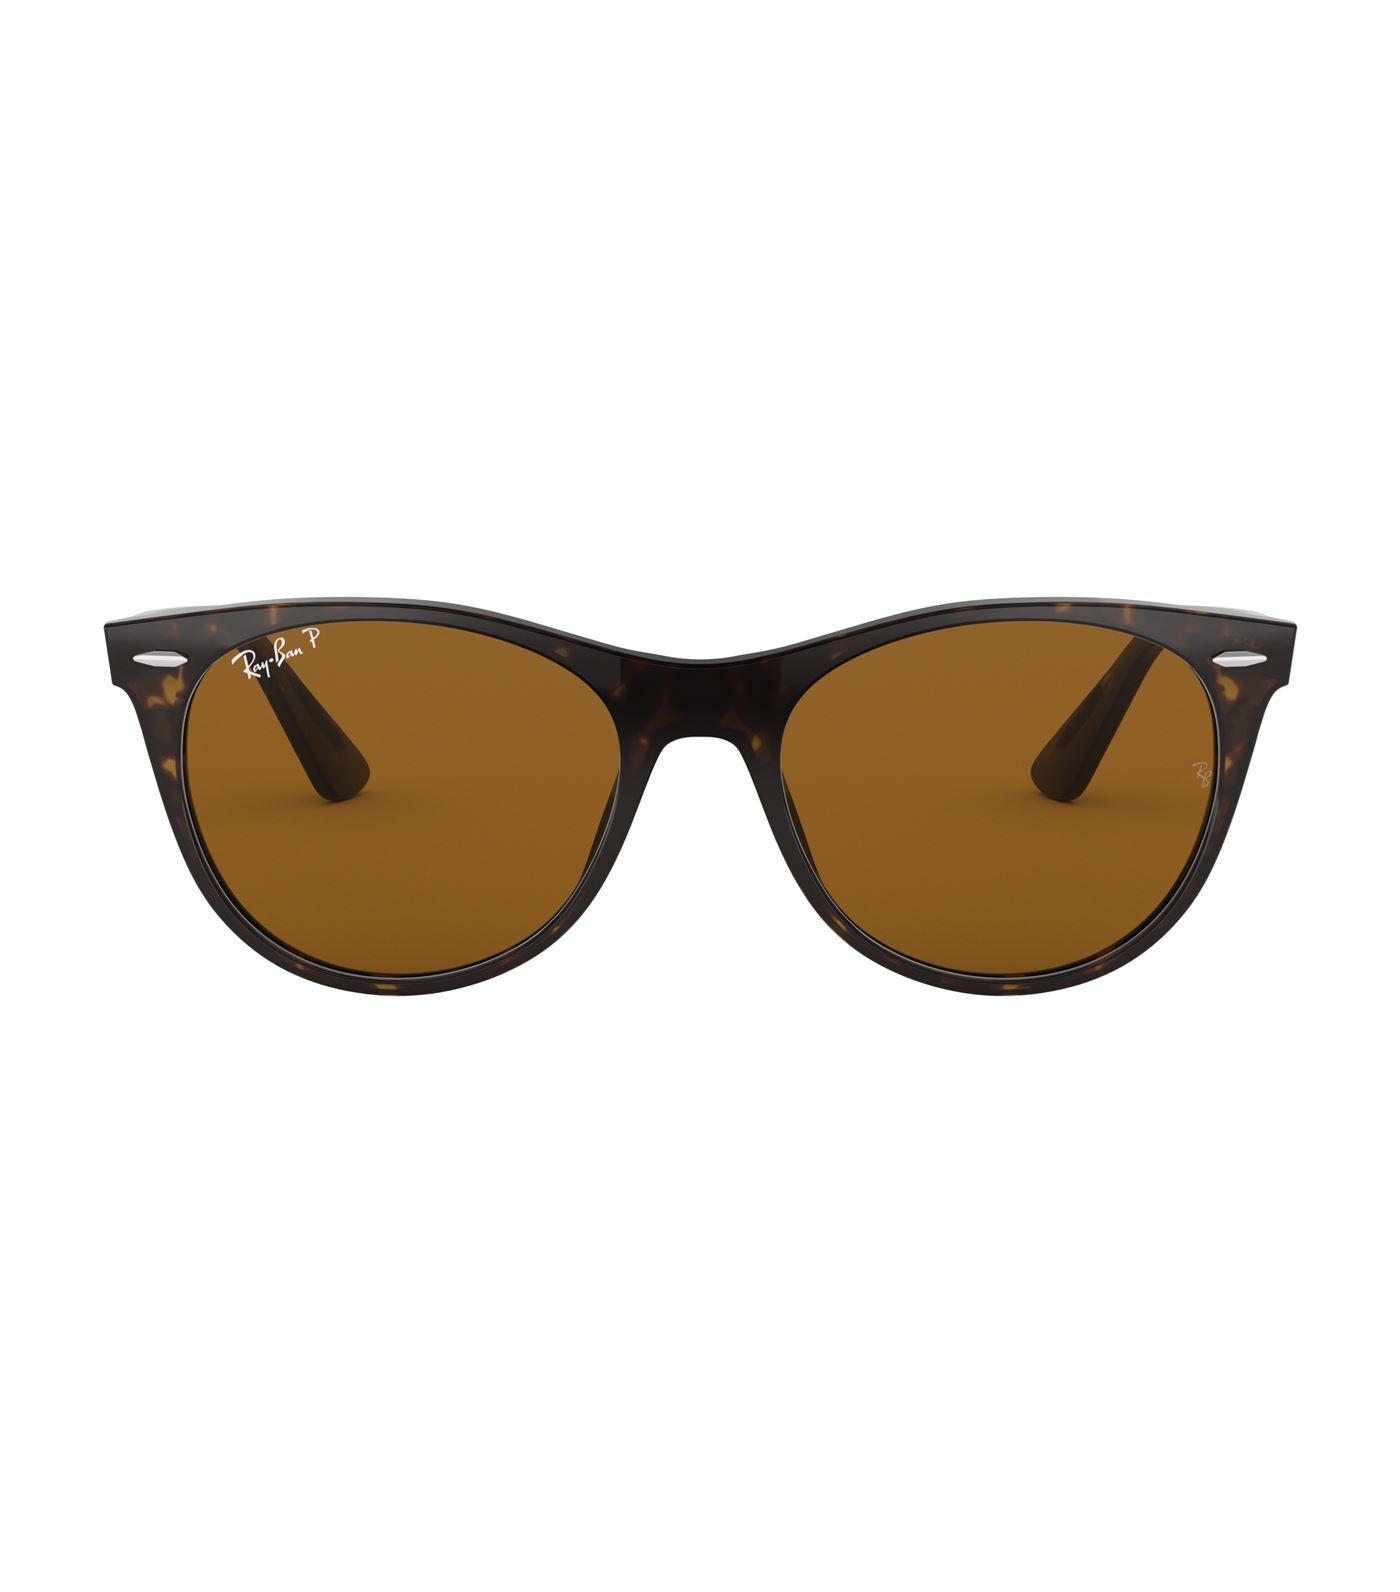 ef2e566495 Ray-Ban Wayfarer Ii Classic Sunglasses in Brown - Save 20% - Lyst